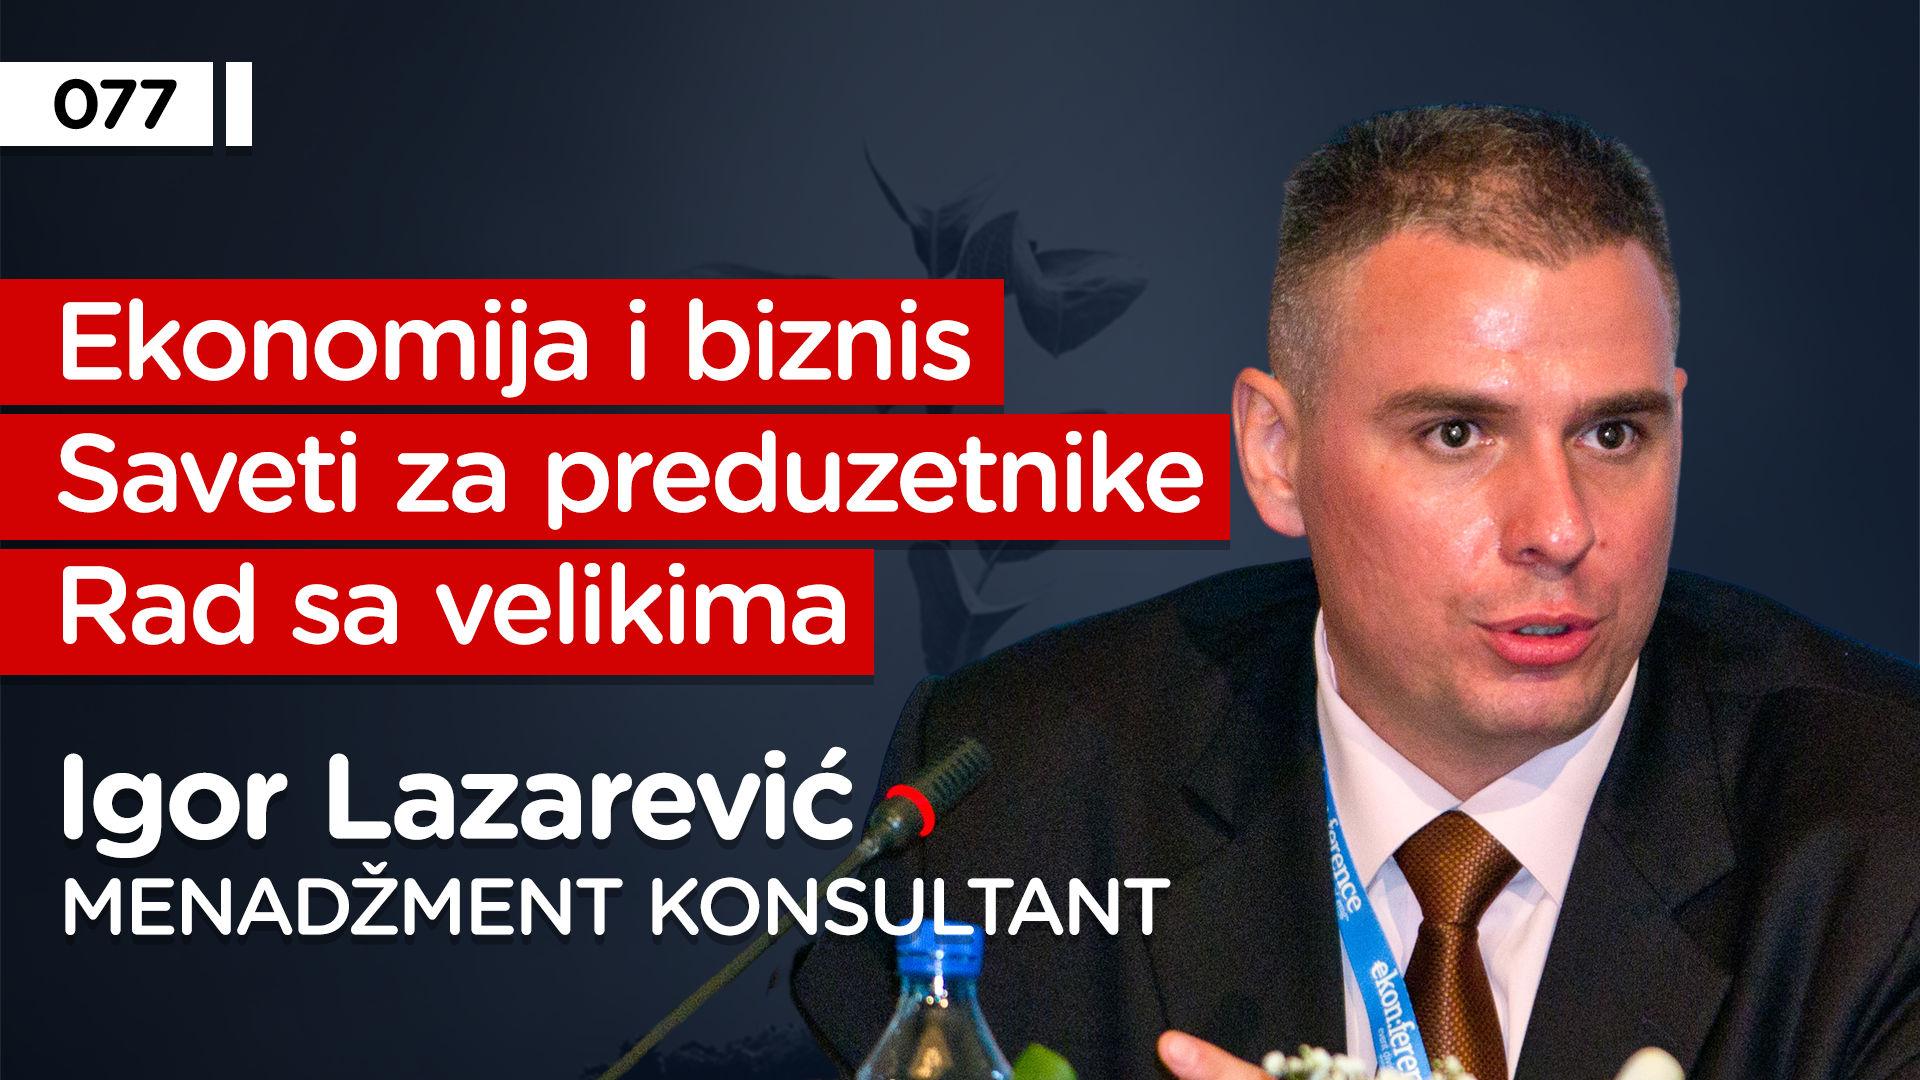 EP077: Igor Lazarević